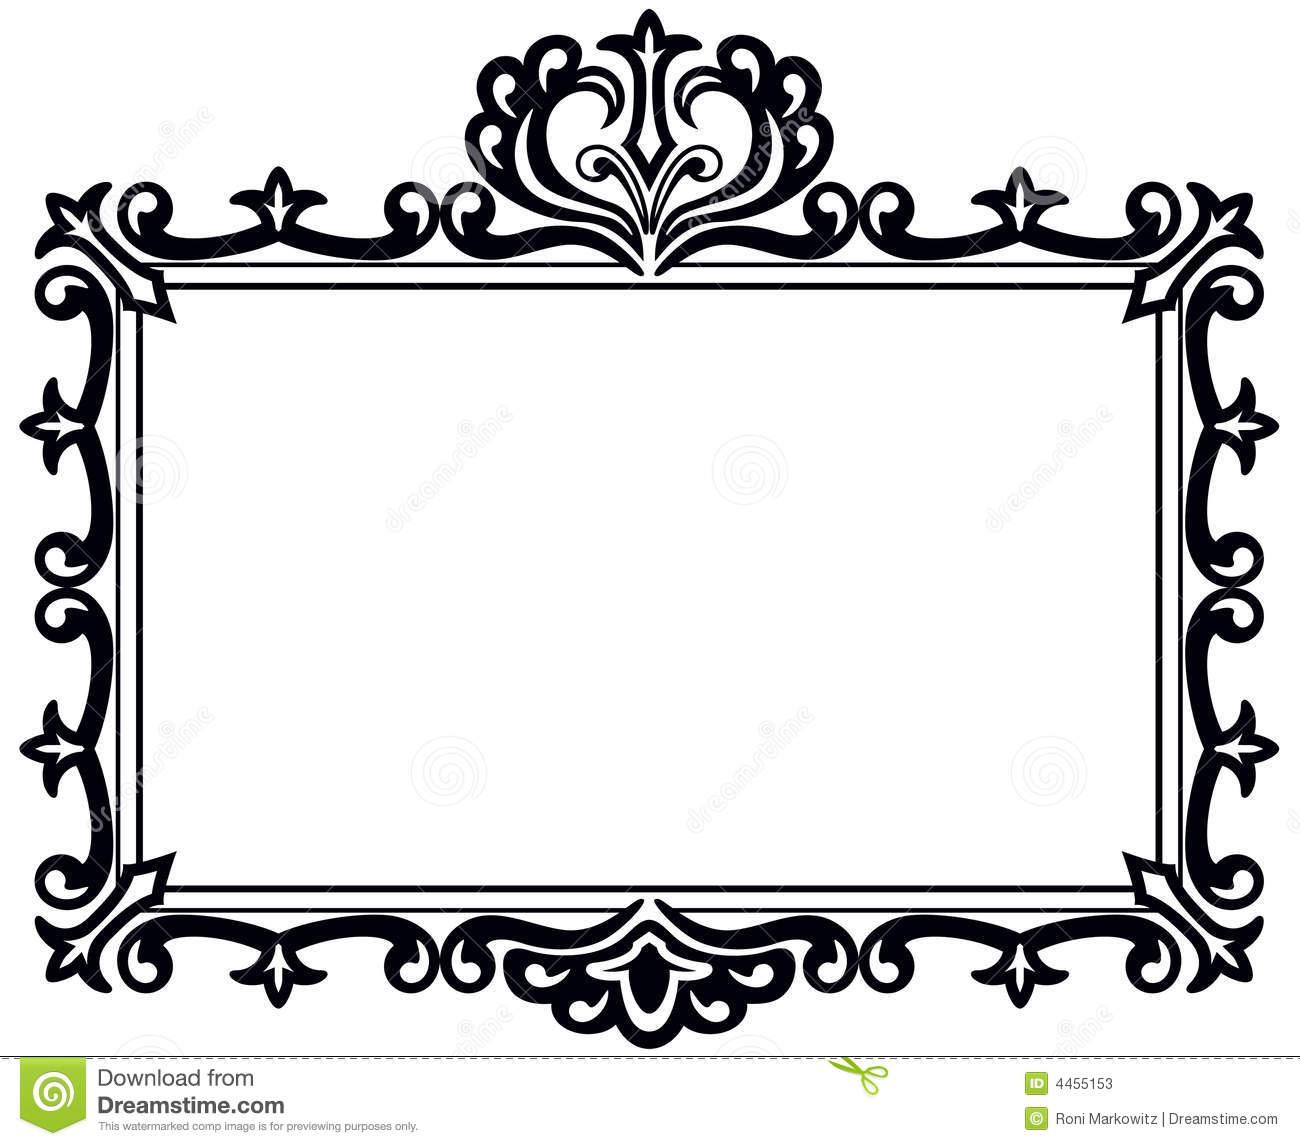 Rectangle frame clipart.